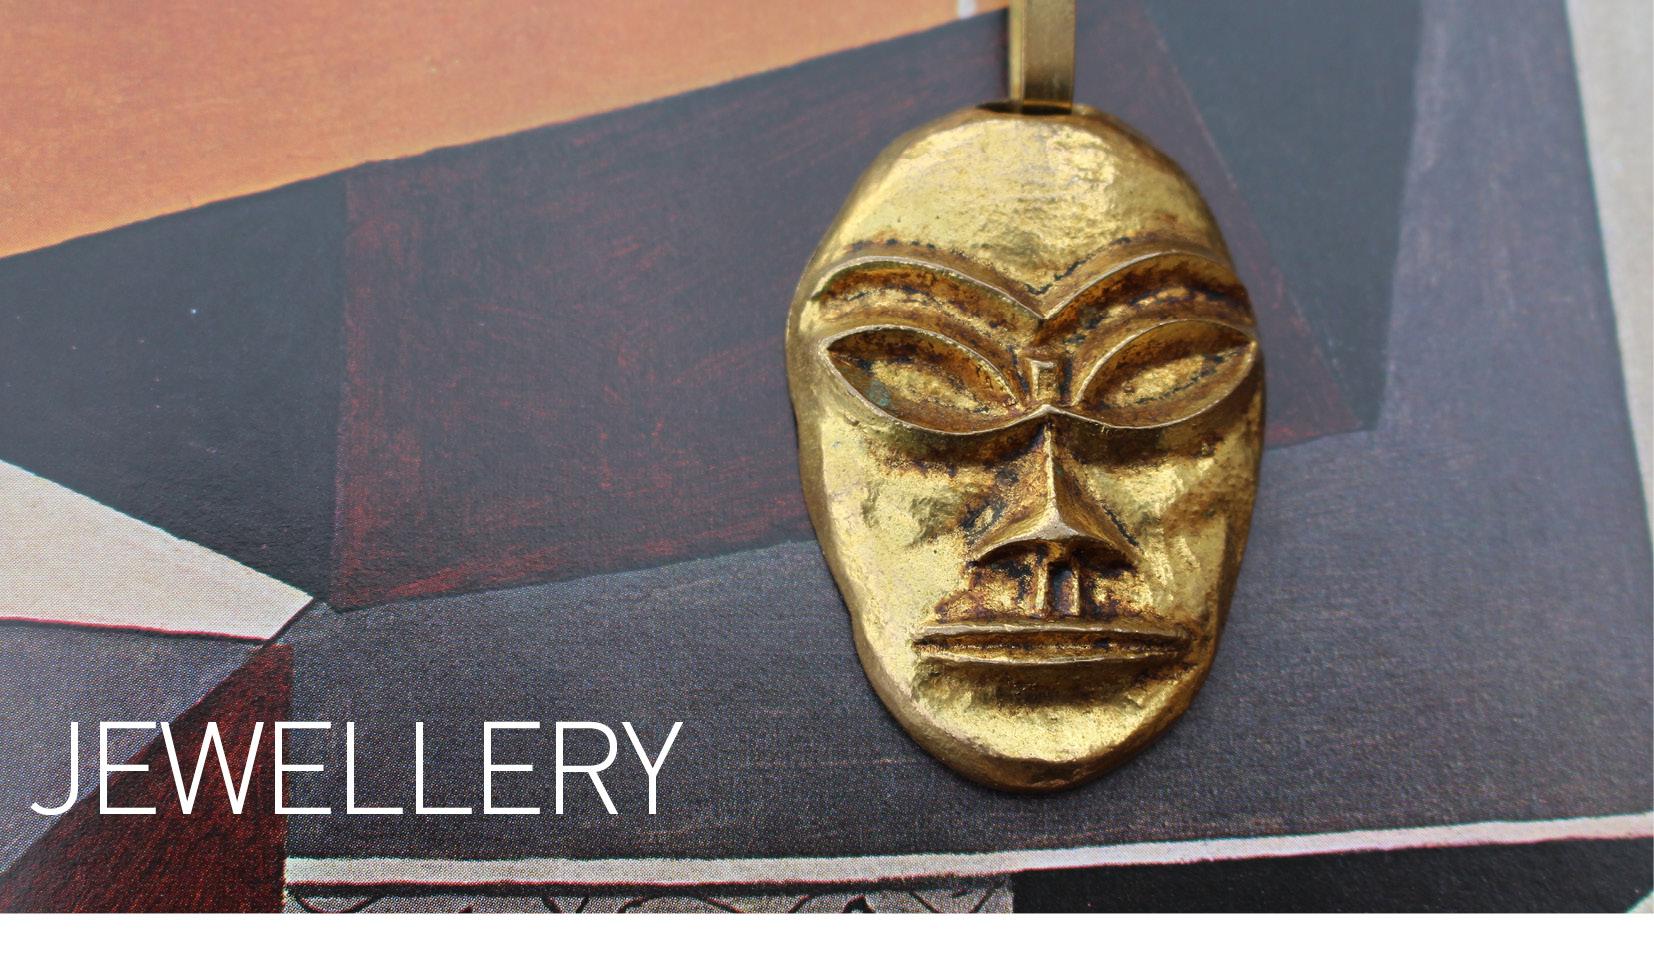 jewellery march 17